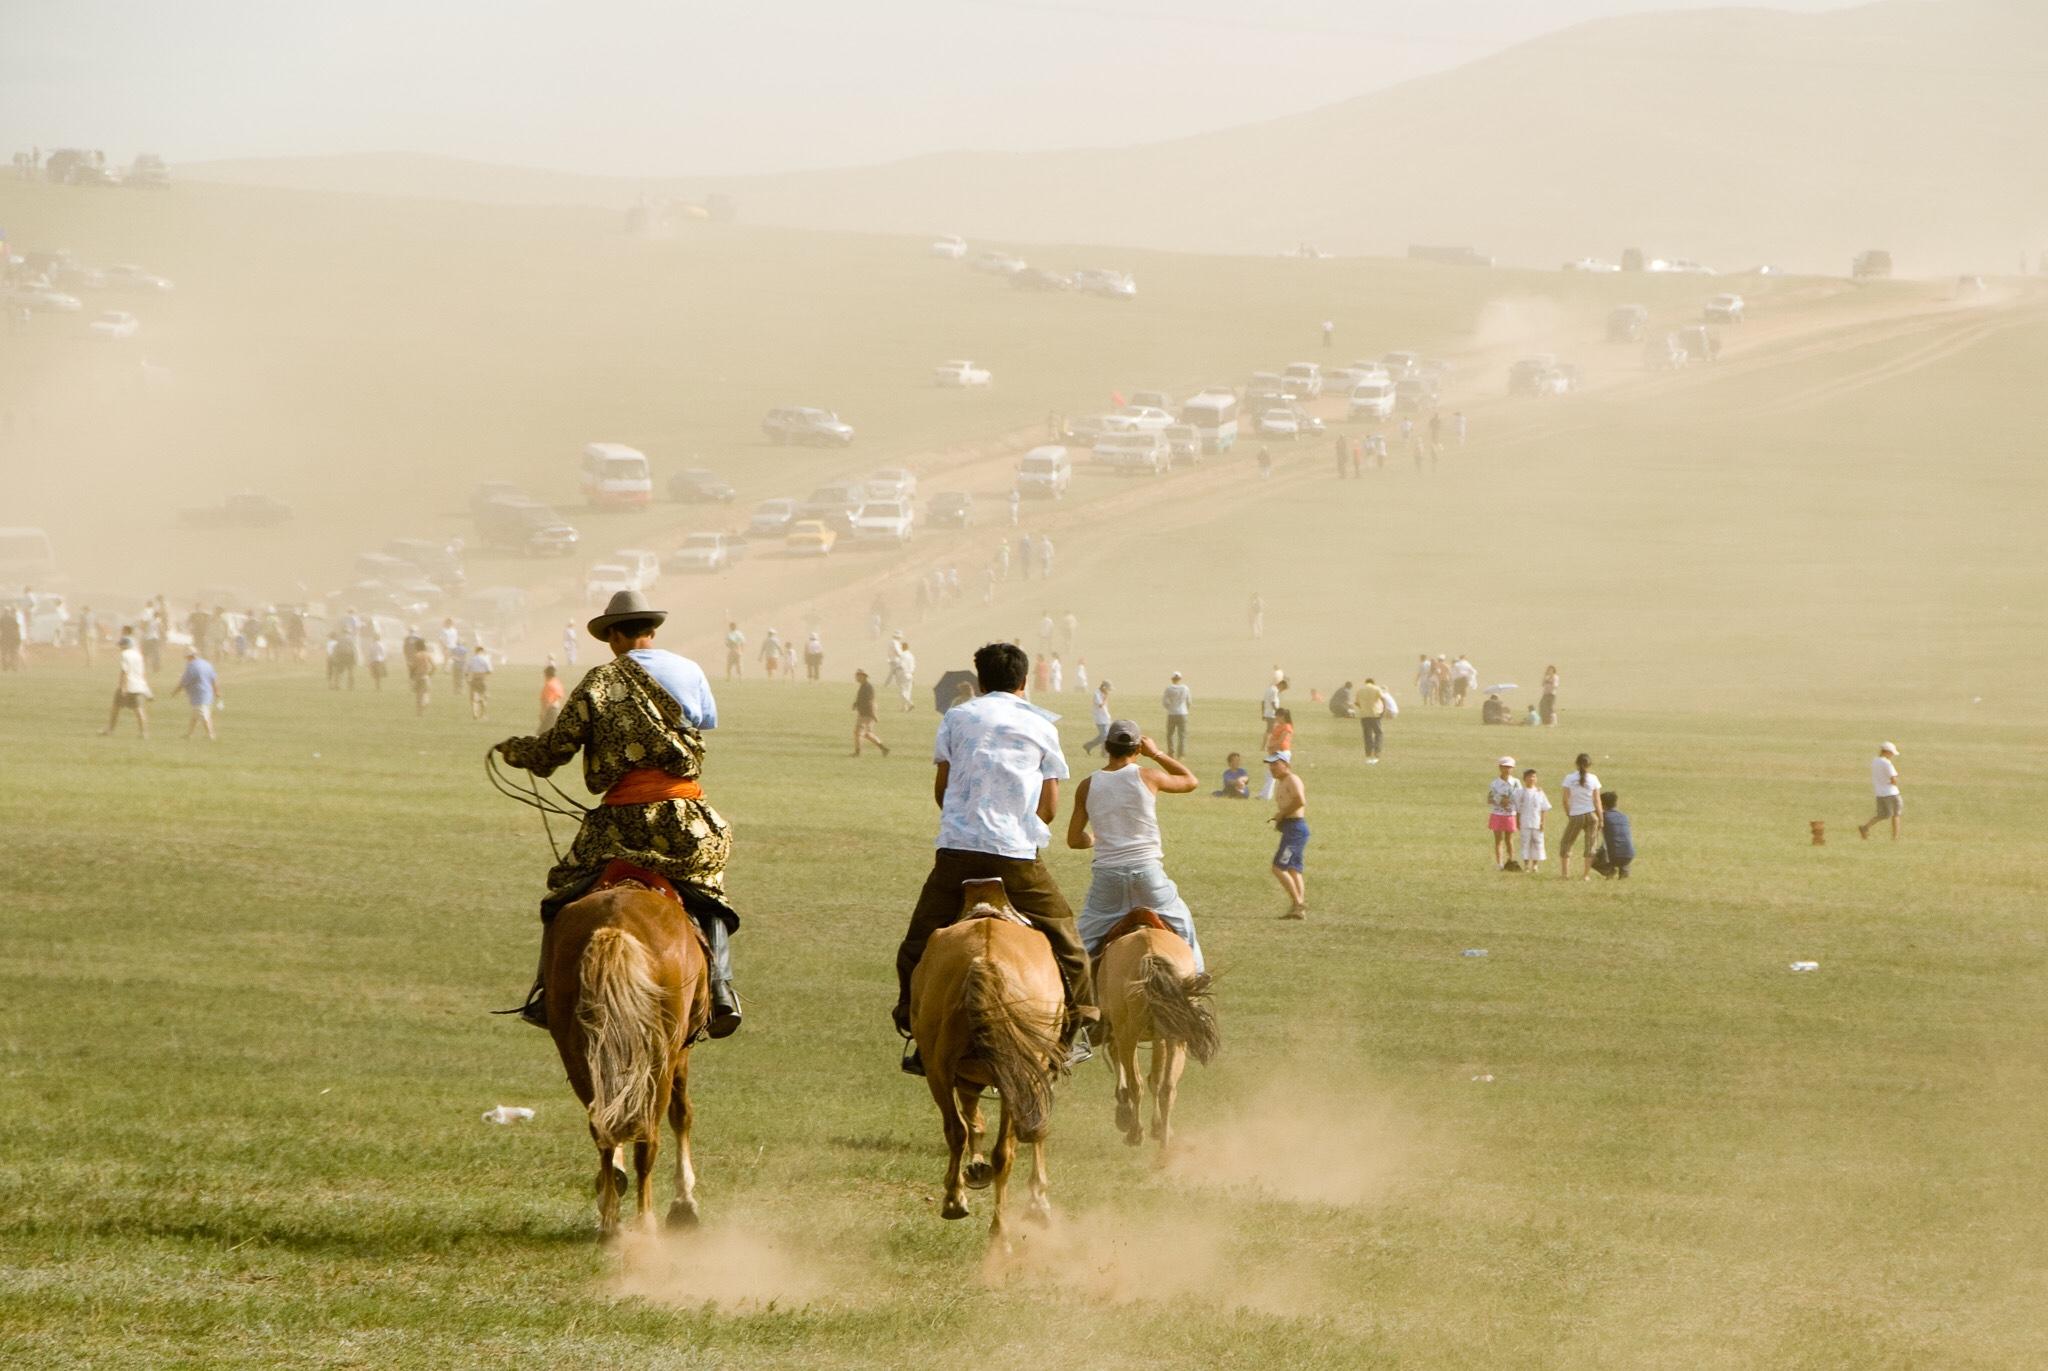 Naadam Festival, Ulaan Baatar, Mongolia, 2007. Naadam celebrates the three manly sports of nomadic Mongolia: wrestling, horse racing and archery.